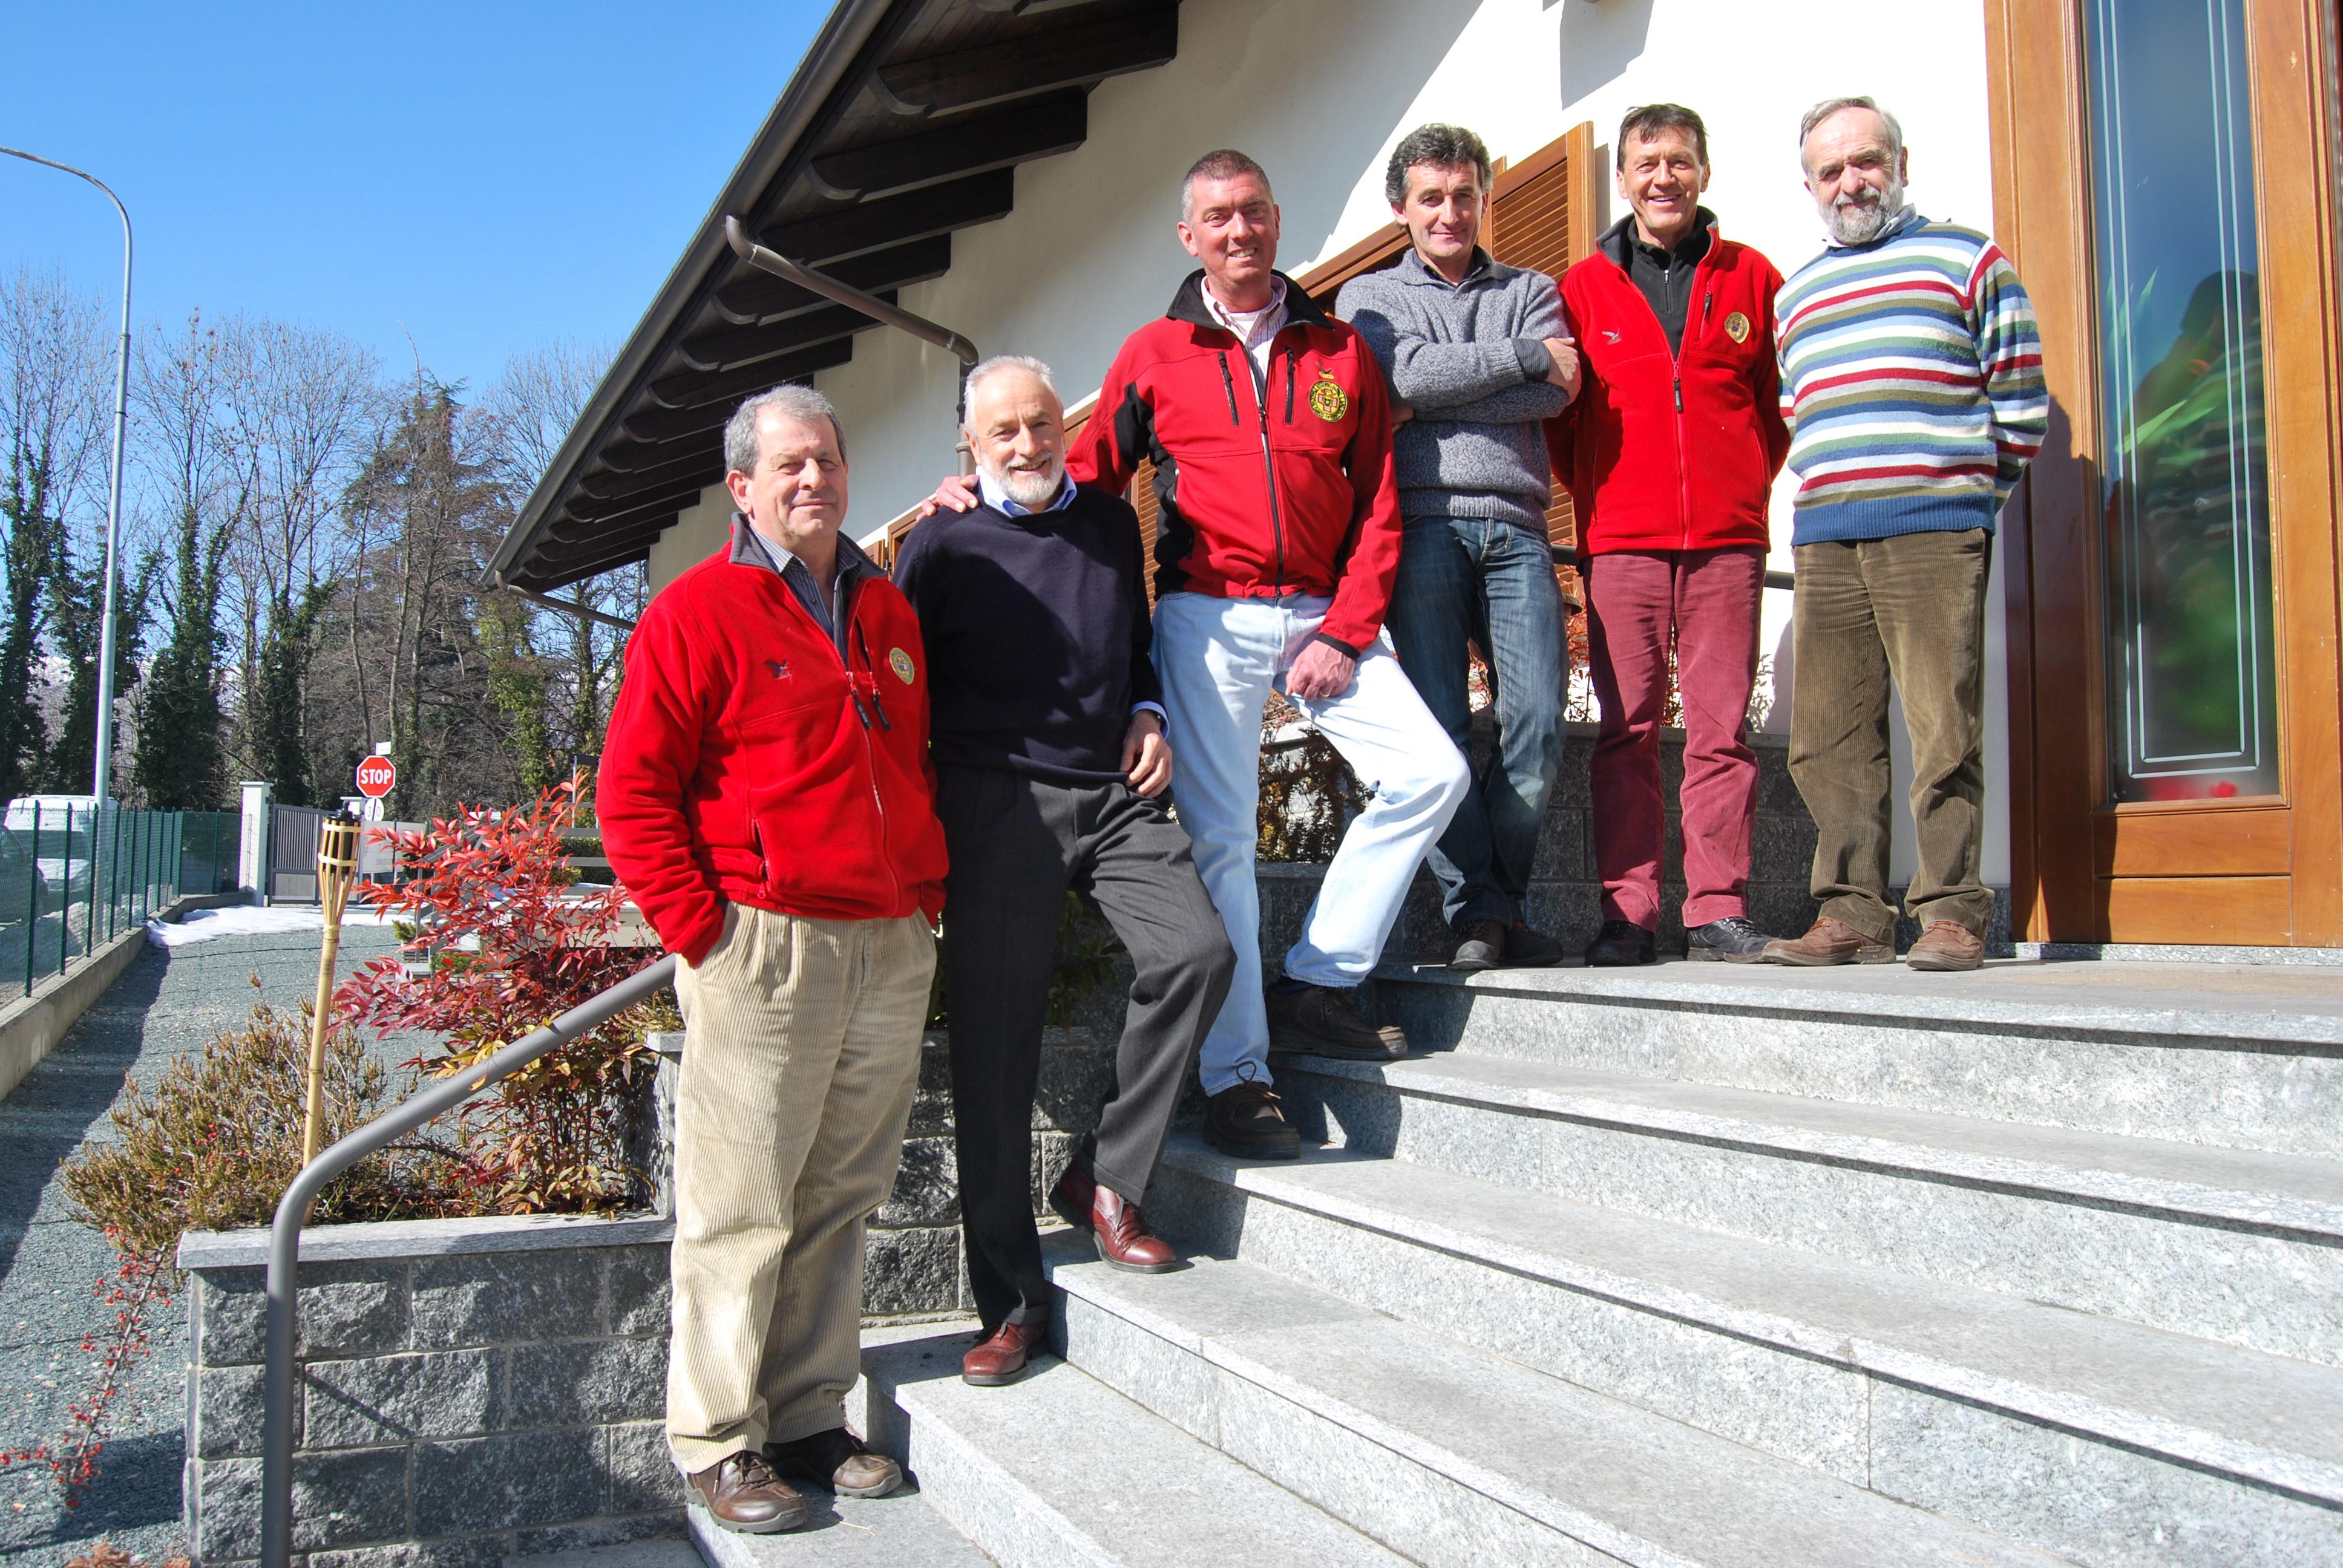 Soccorso Alpino Piemontese, il presidente è il giavenese Luca Giaj Arcota